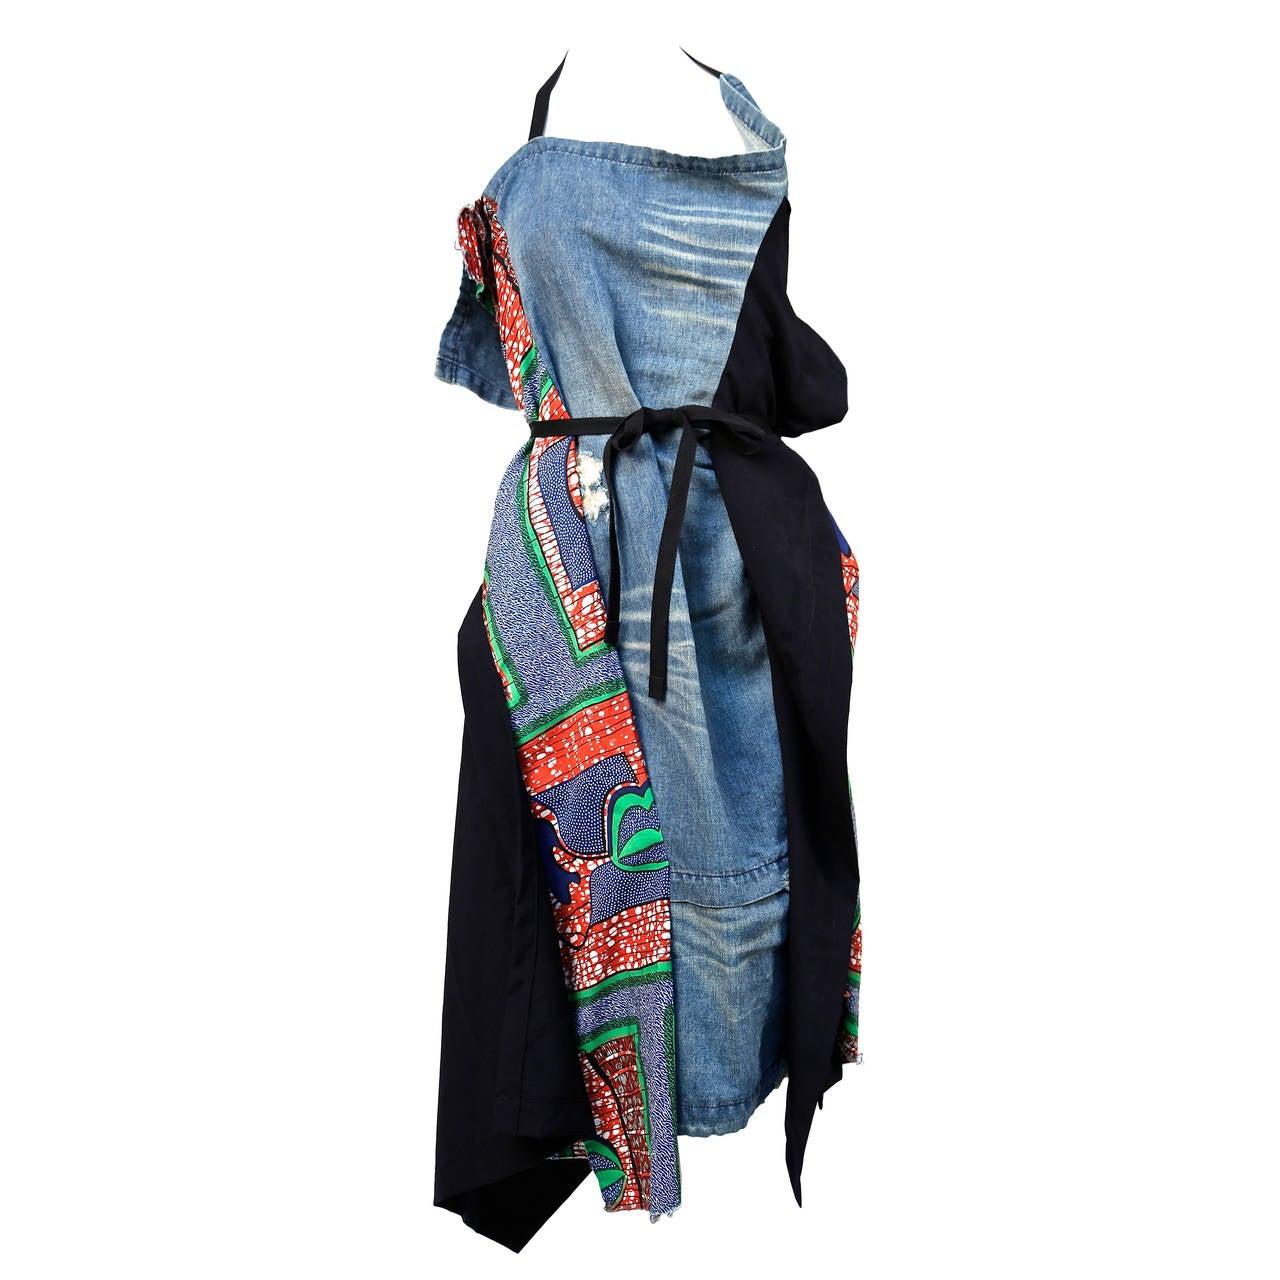 JUNYA WATANABE African printed cotton and denim wrap apron dress 1